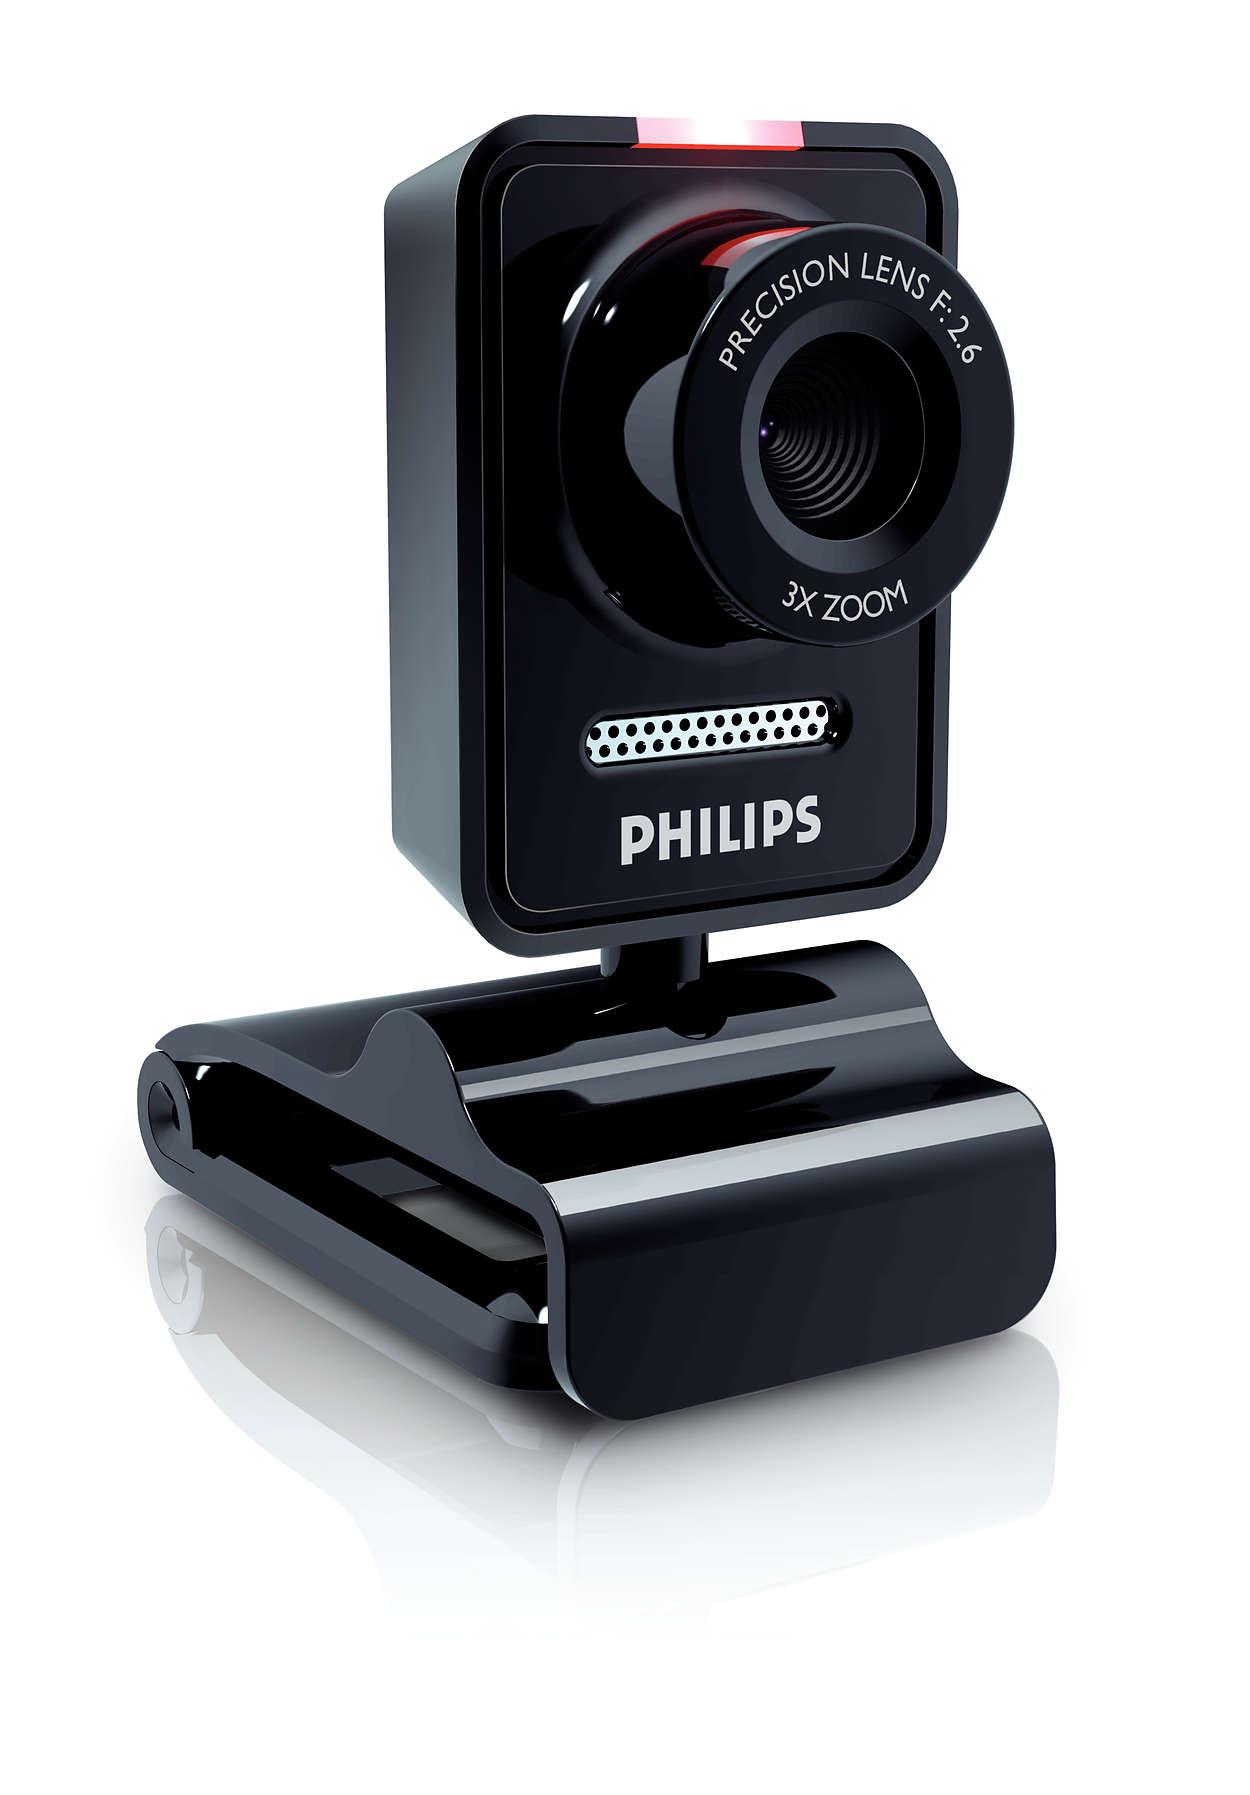 notebook webcam spc530nc 00 philips. Black Bedroom Furniture Sets. Home Design Ideas